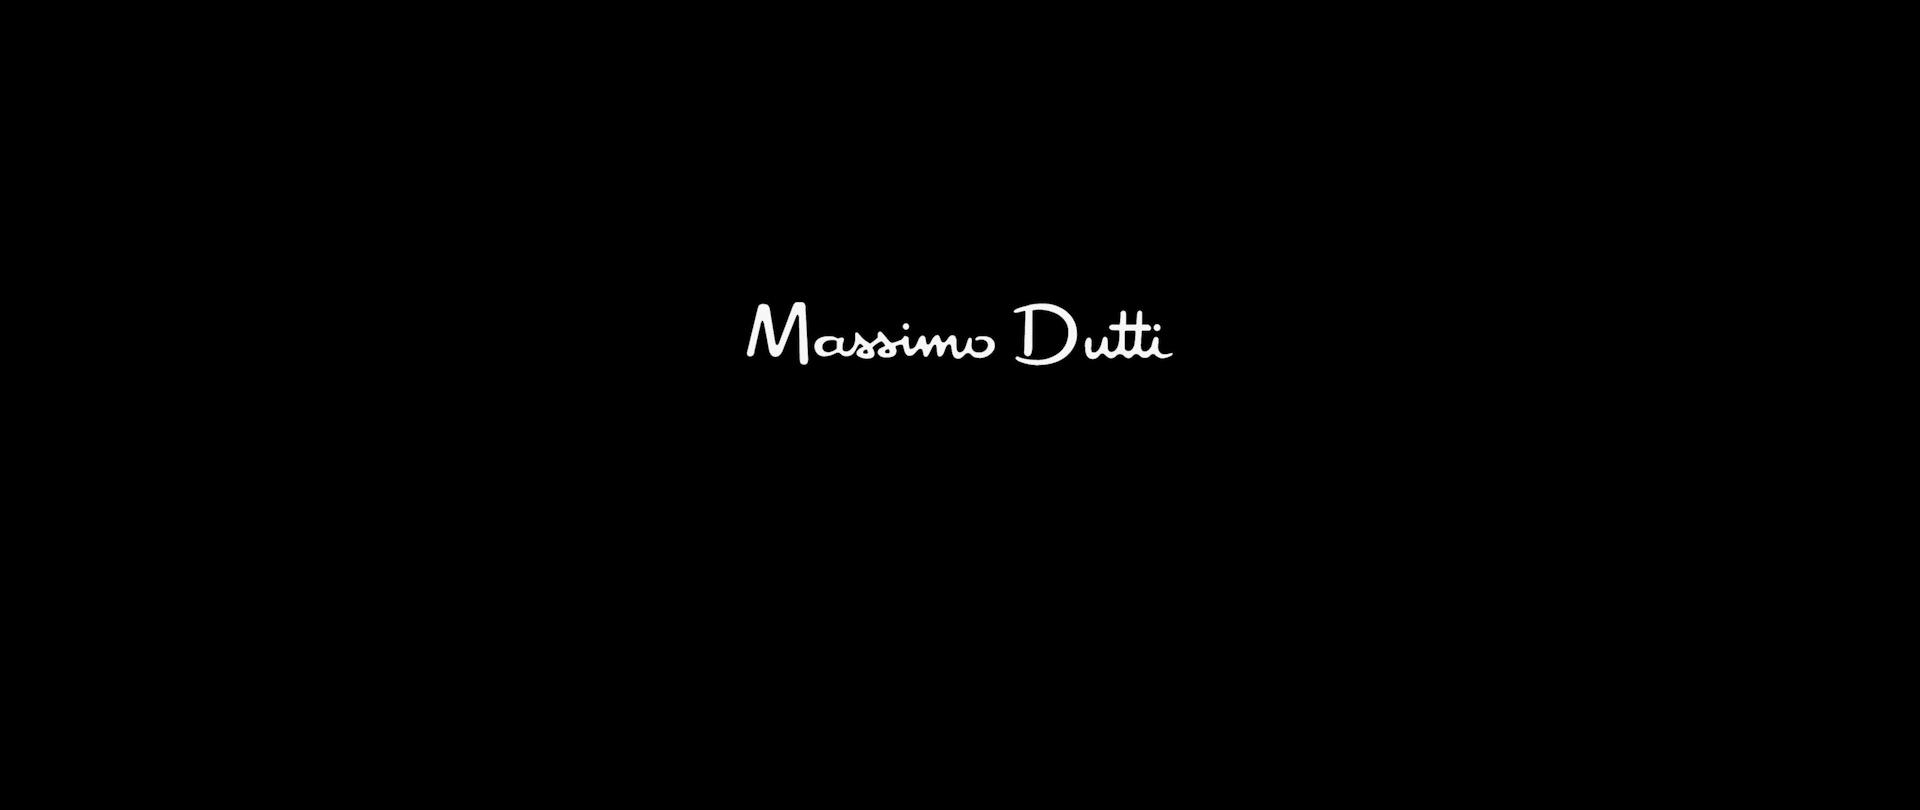 Massimo Dutti .00_04_22_12.Still044.jpg